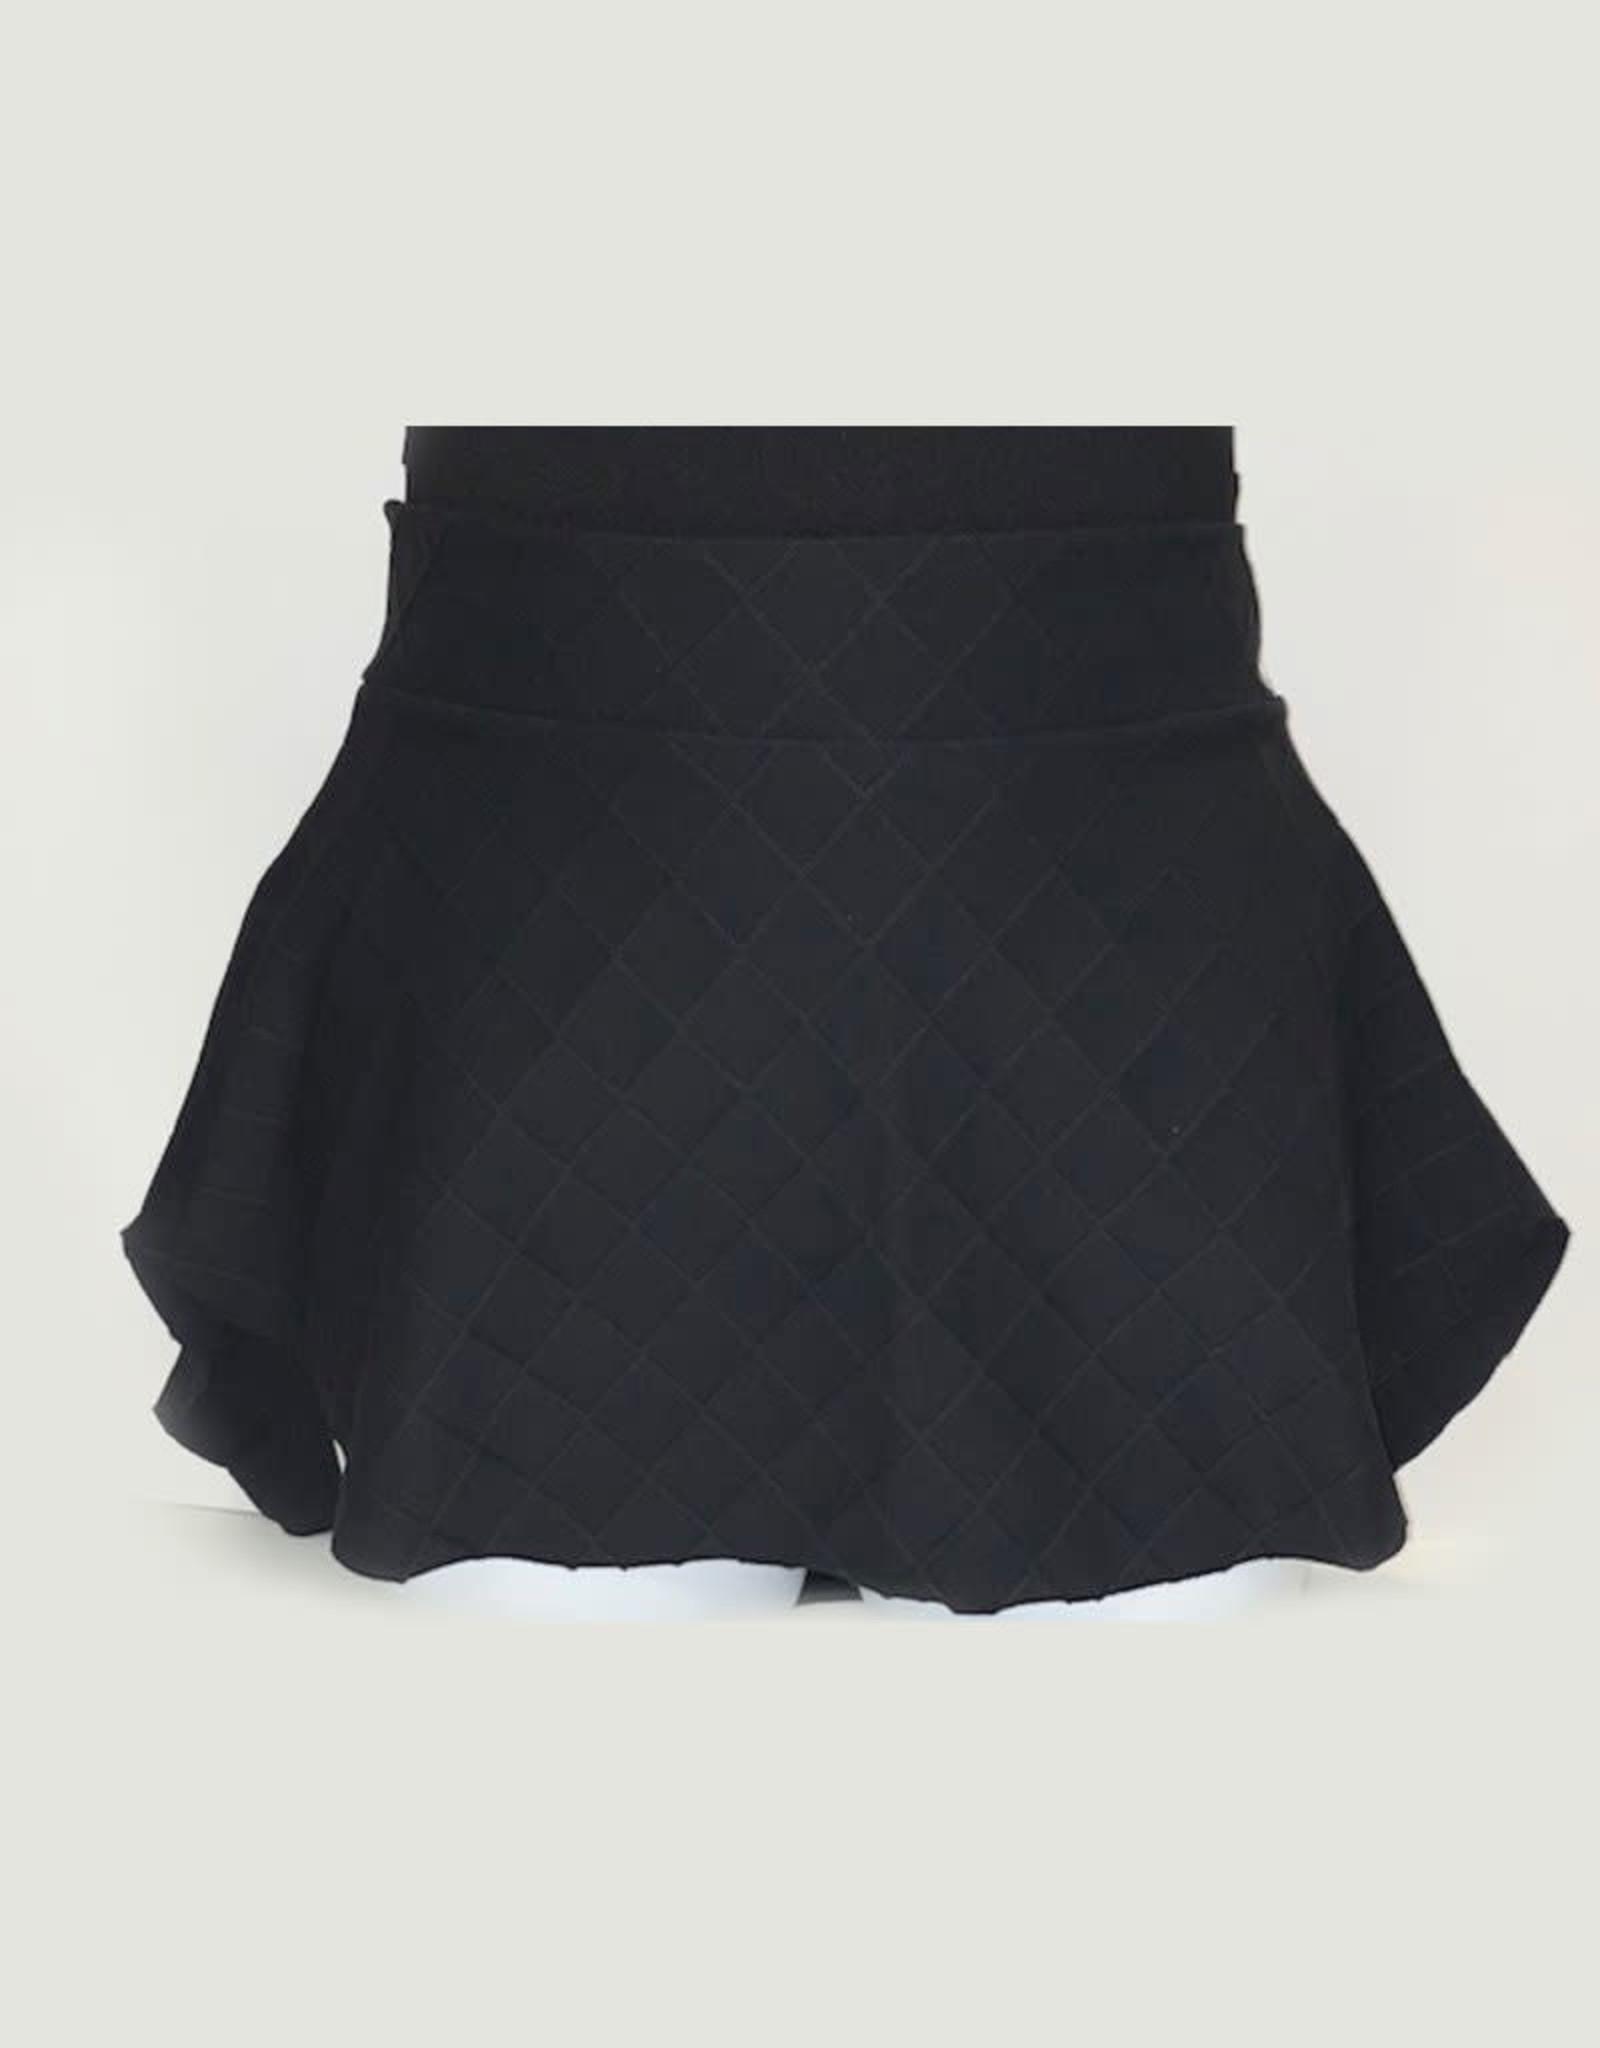 Motionwear Skirt style 1236